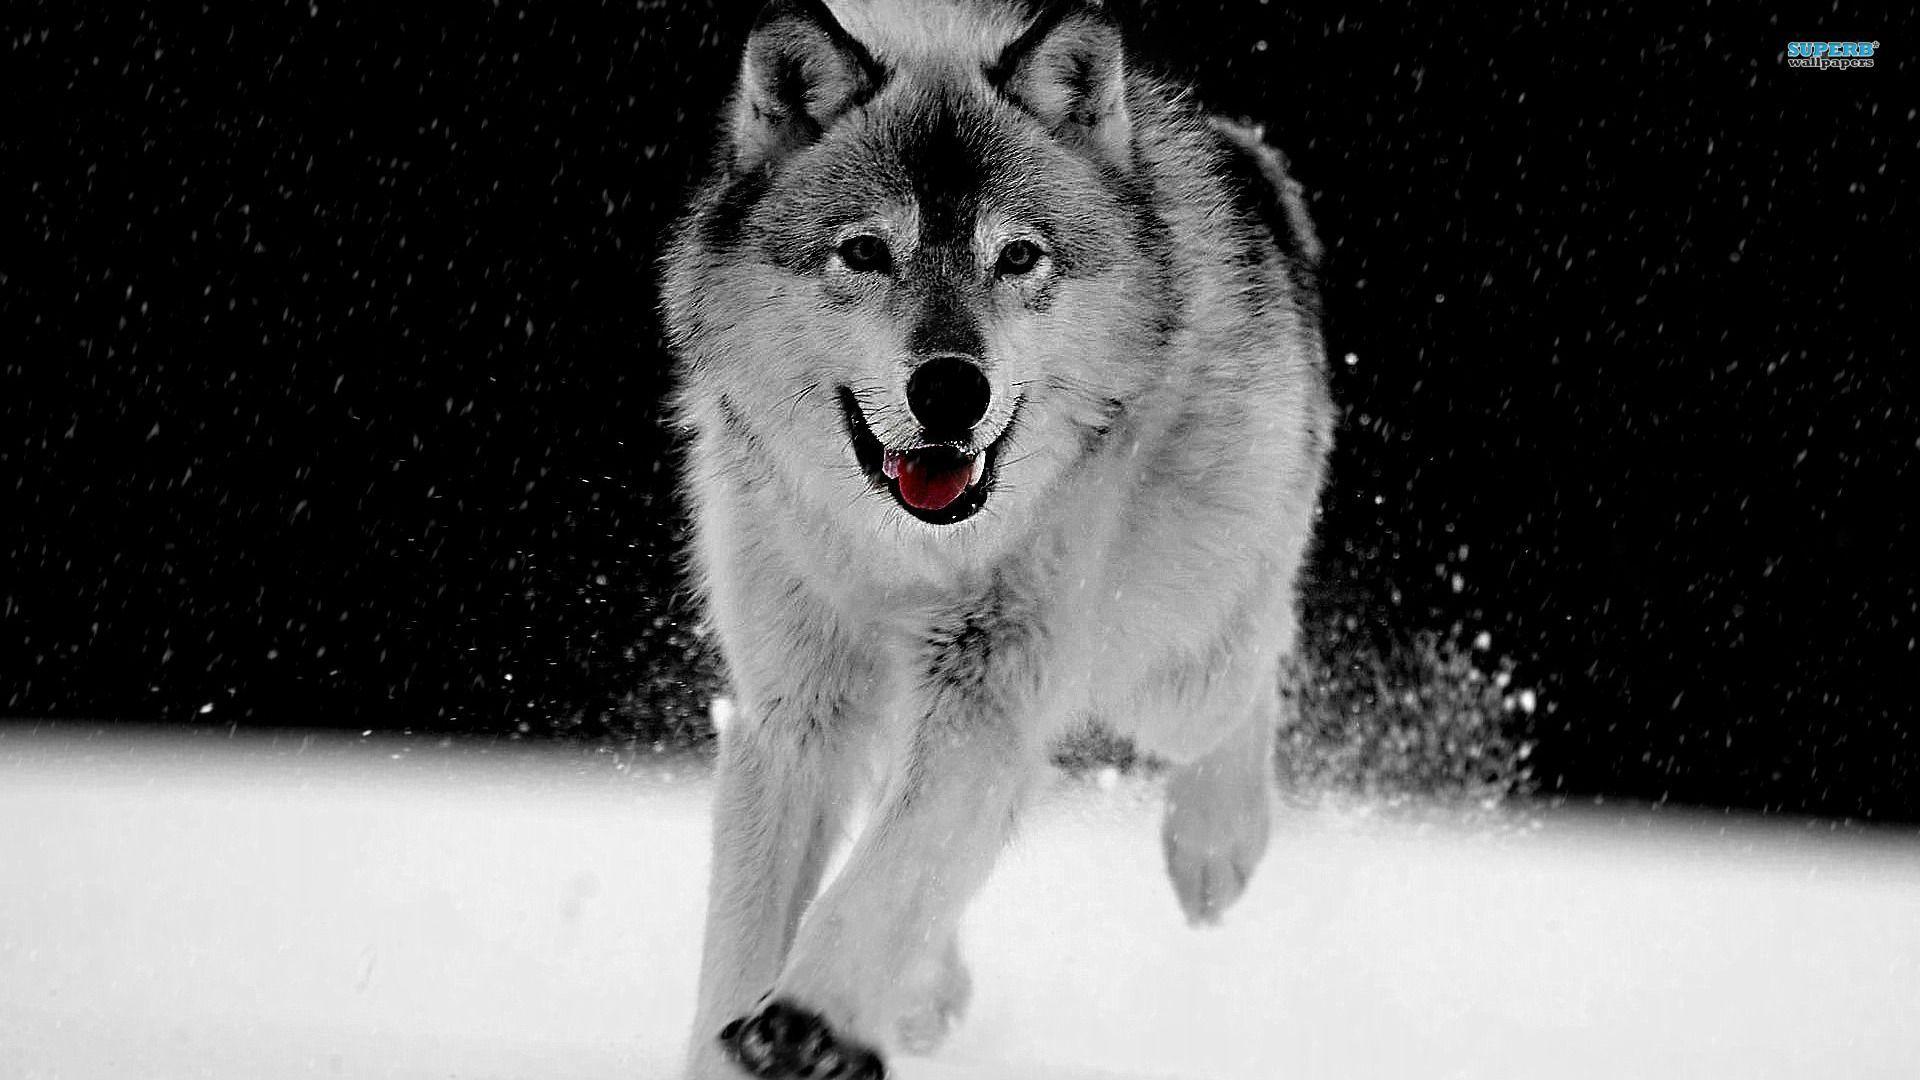 Beautiful Gray Wolf Wallpaper Laptop - c3d54753020605f633e505f55c553fbe  Best Photo Reference_668062.jpg